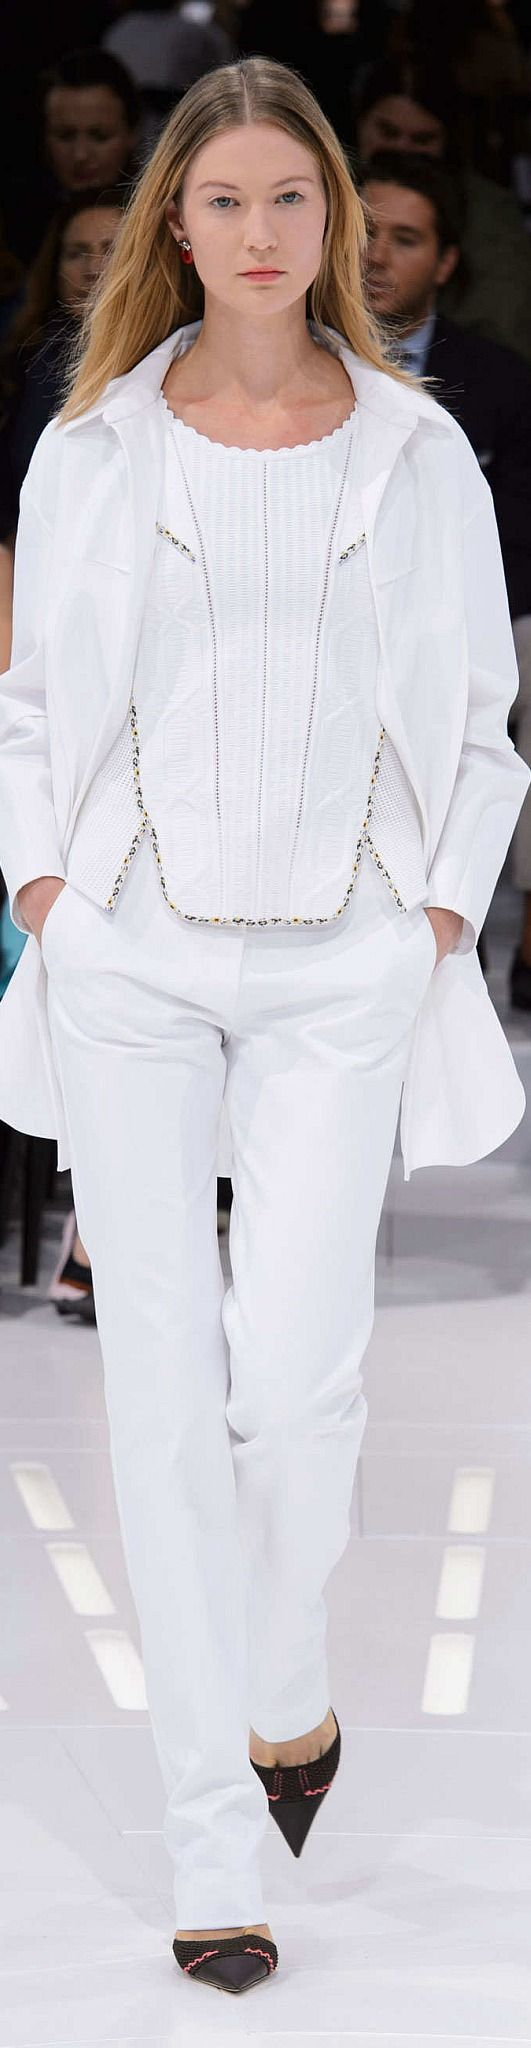 Christian Dior Collection Spring 2015